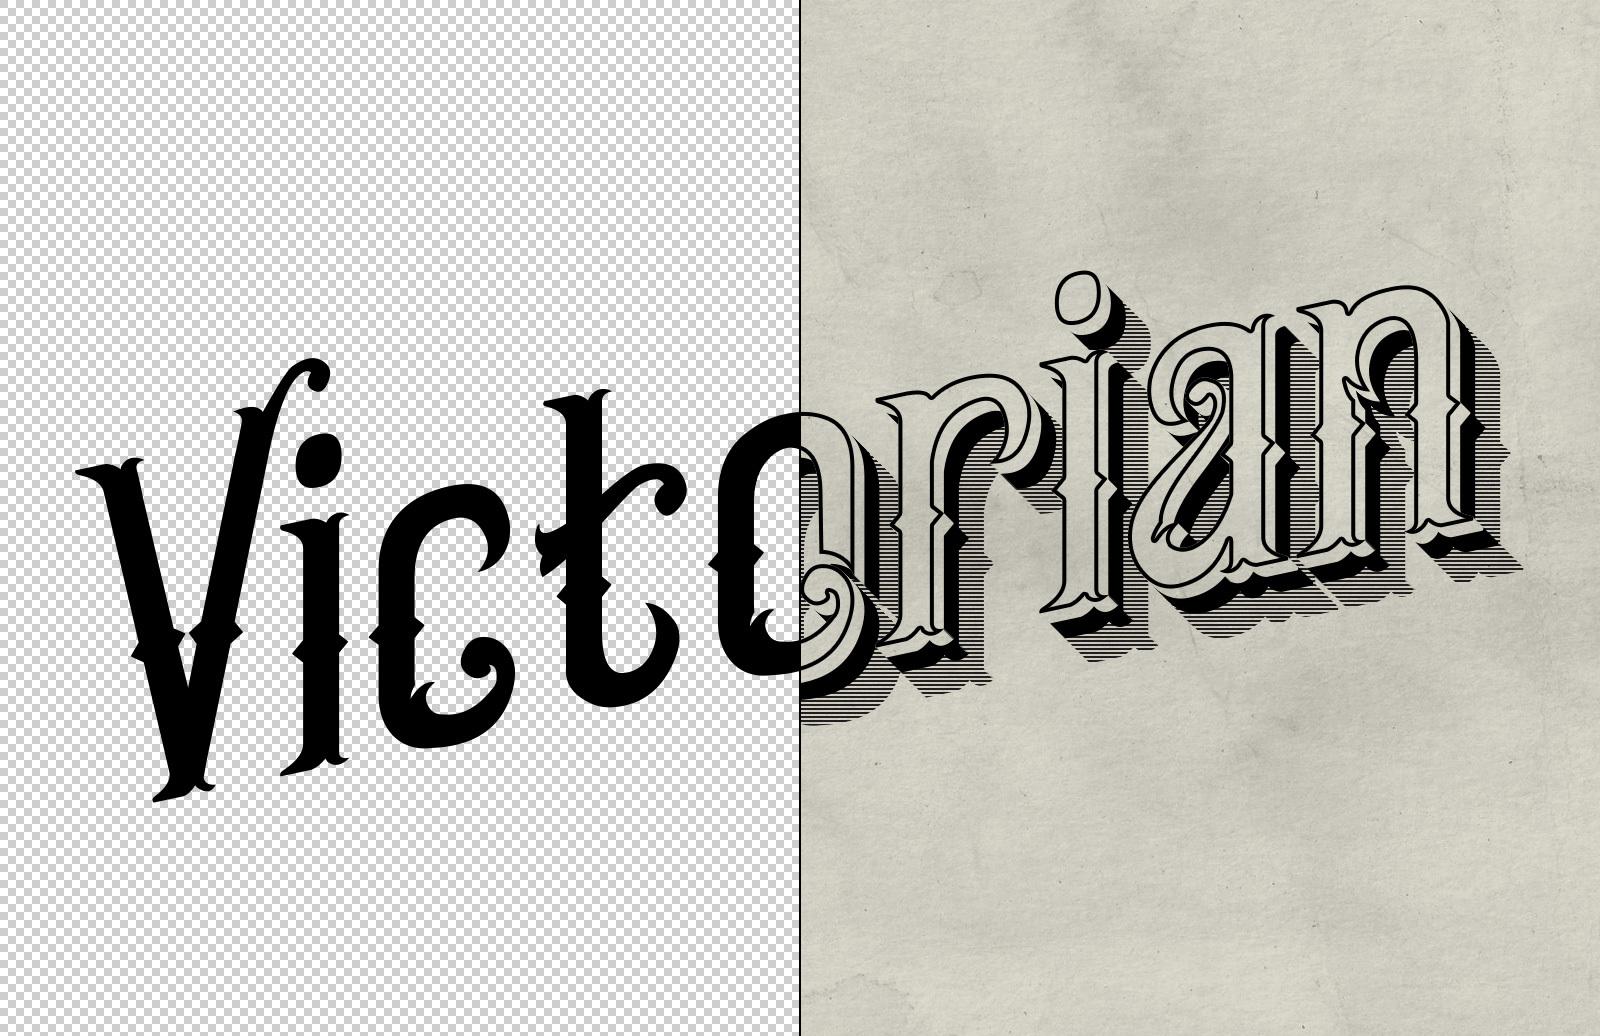 Victorian Text Mockup 2